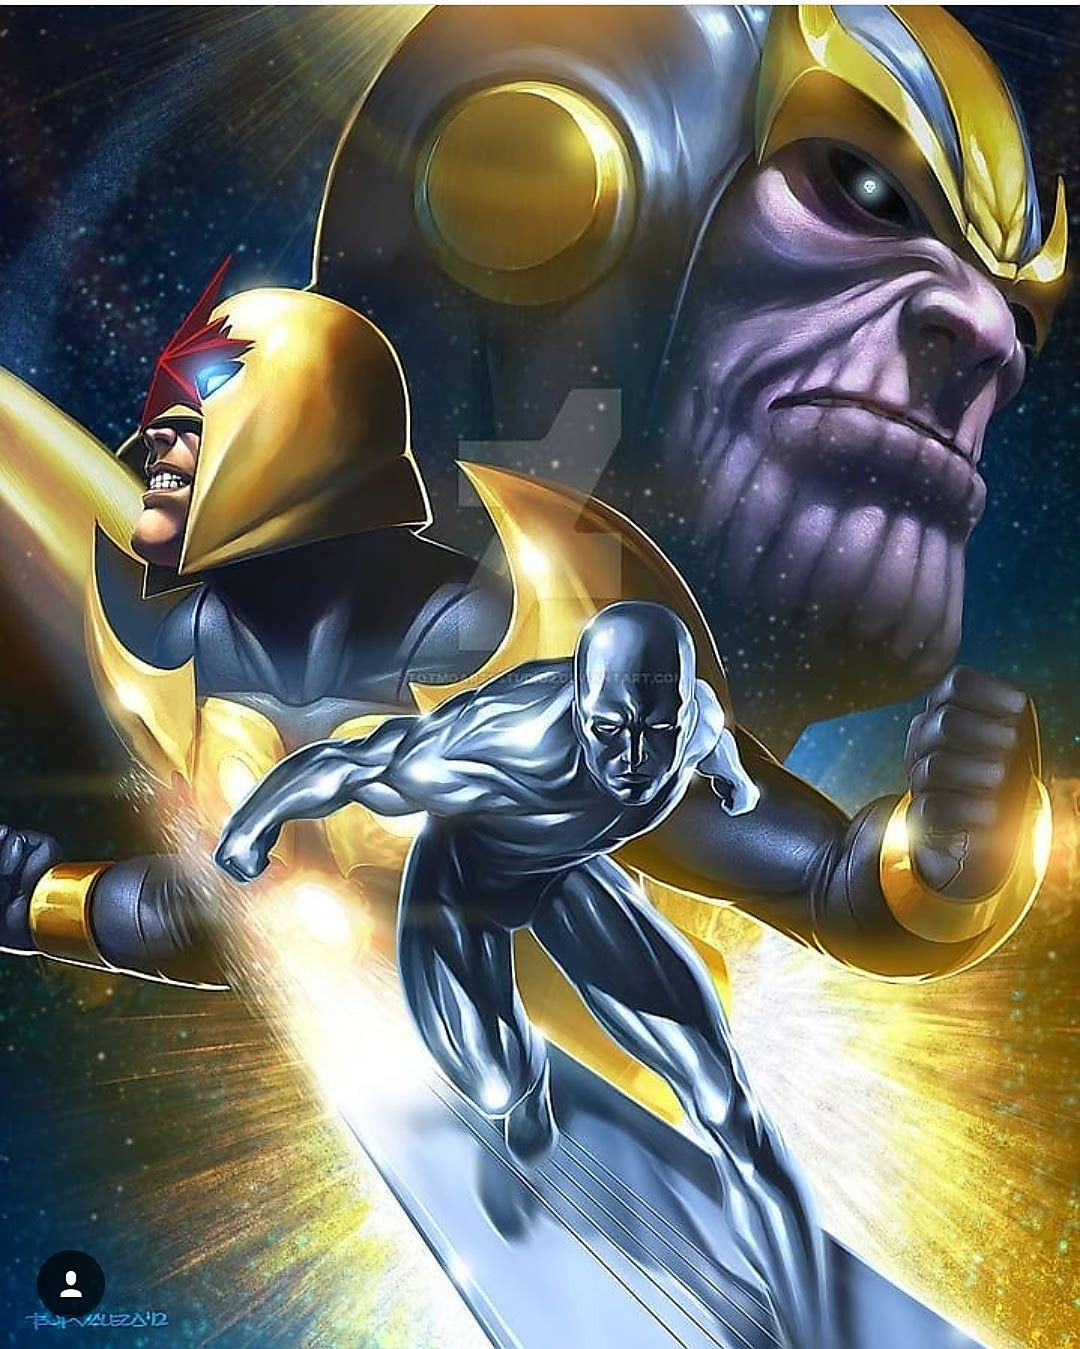 Silver Surfer, Nova & Thanos Marvel comics art, Silver